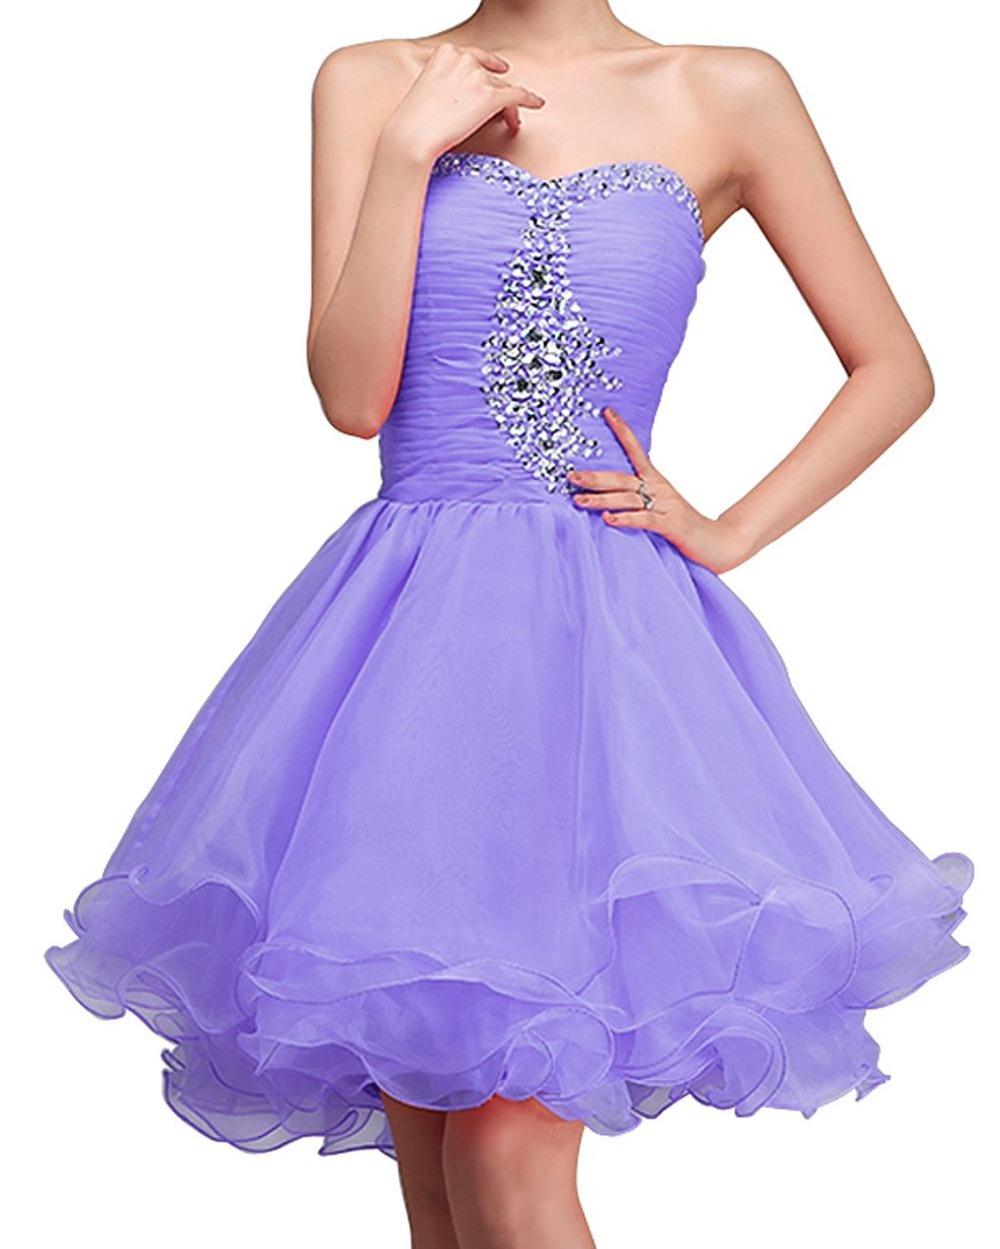 off the shoulder teen dresses jpg 422x640